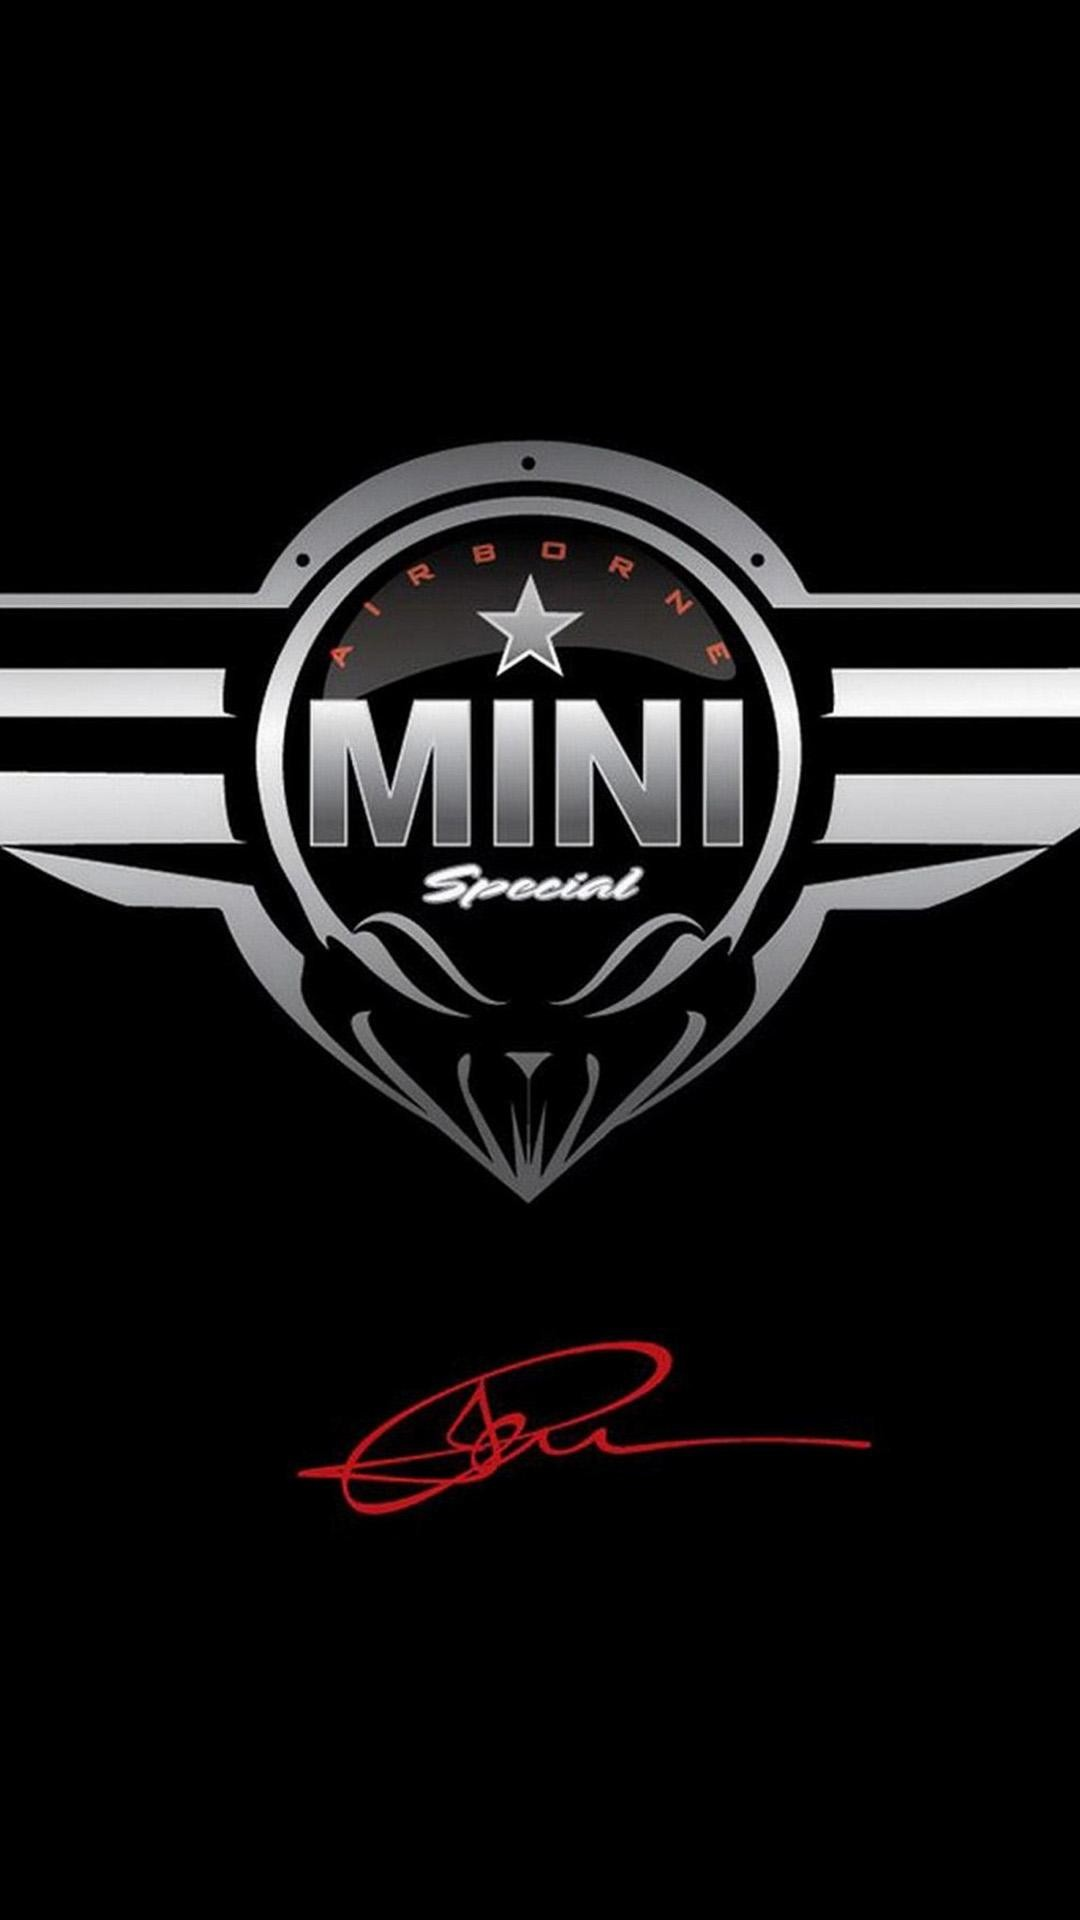 android logo wallpaper cars MINI LOGO